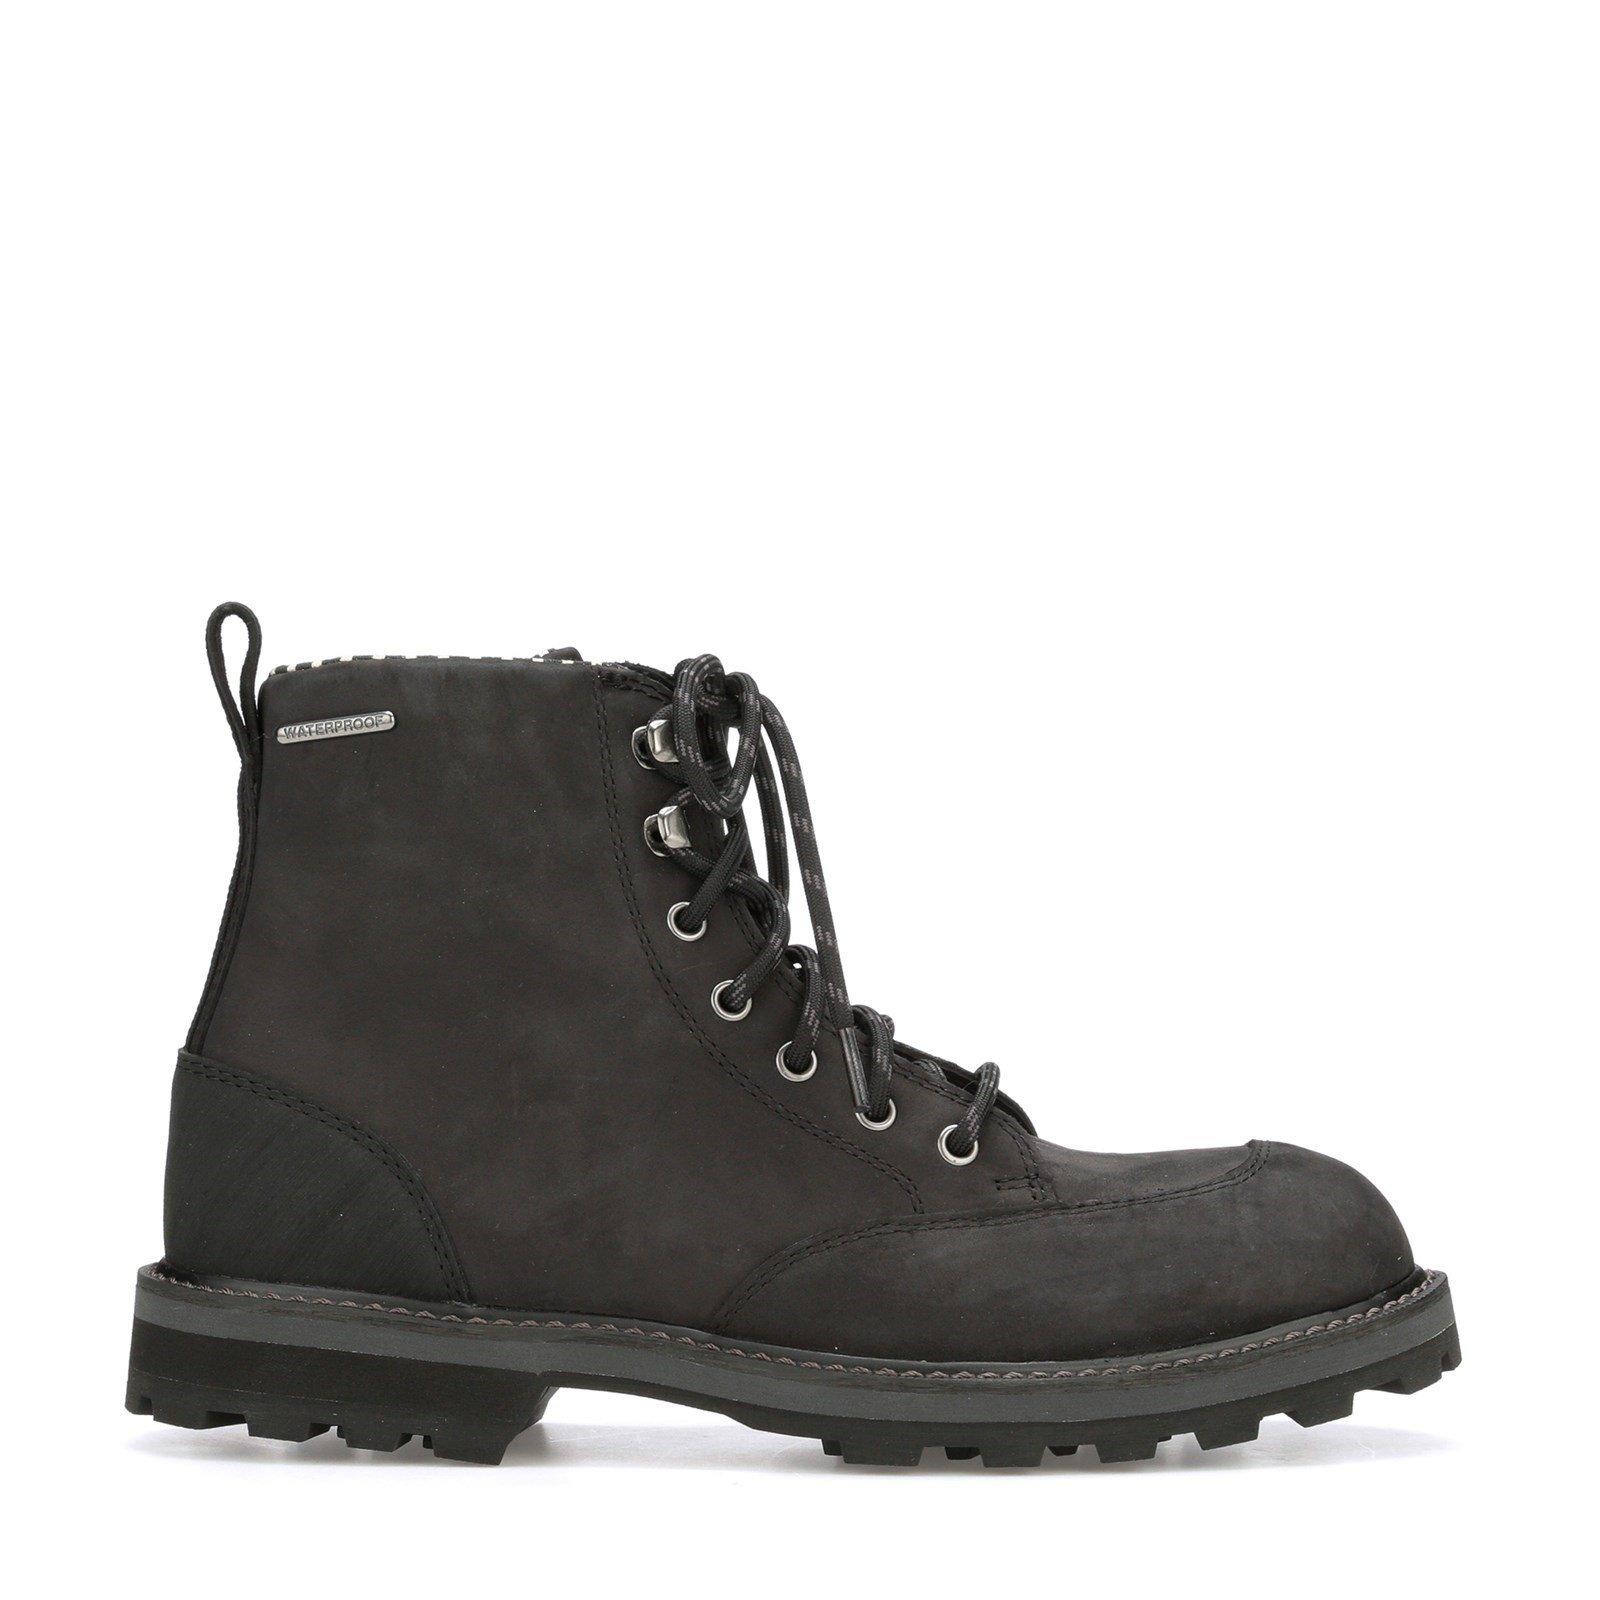 Muck Boots Men's Foreman Boot Black 31854 - Black 10